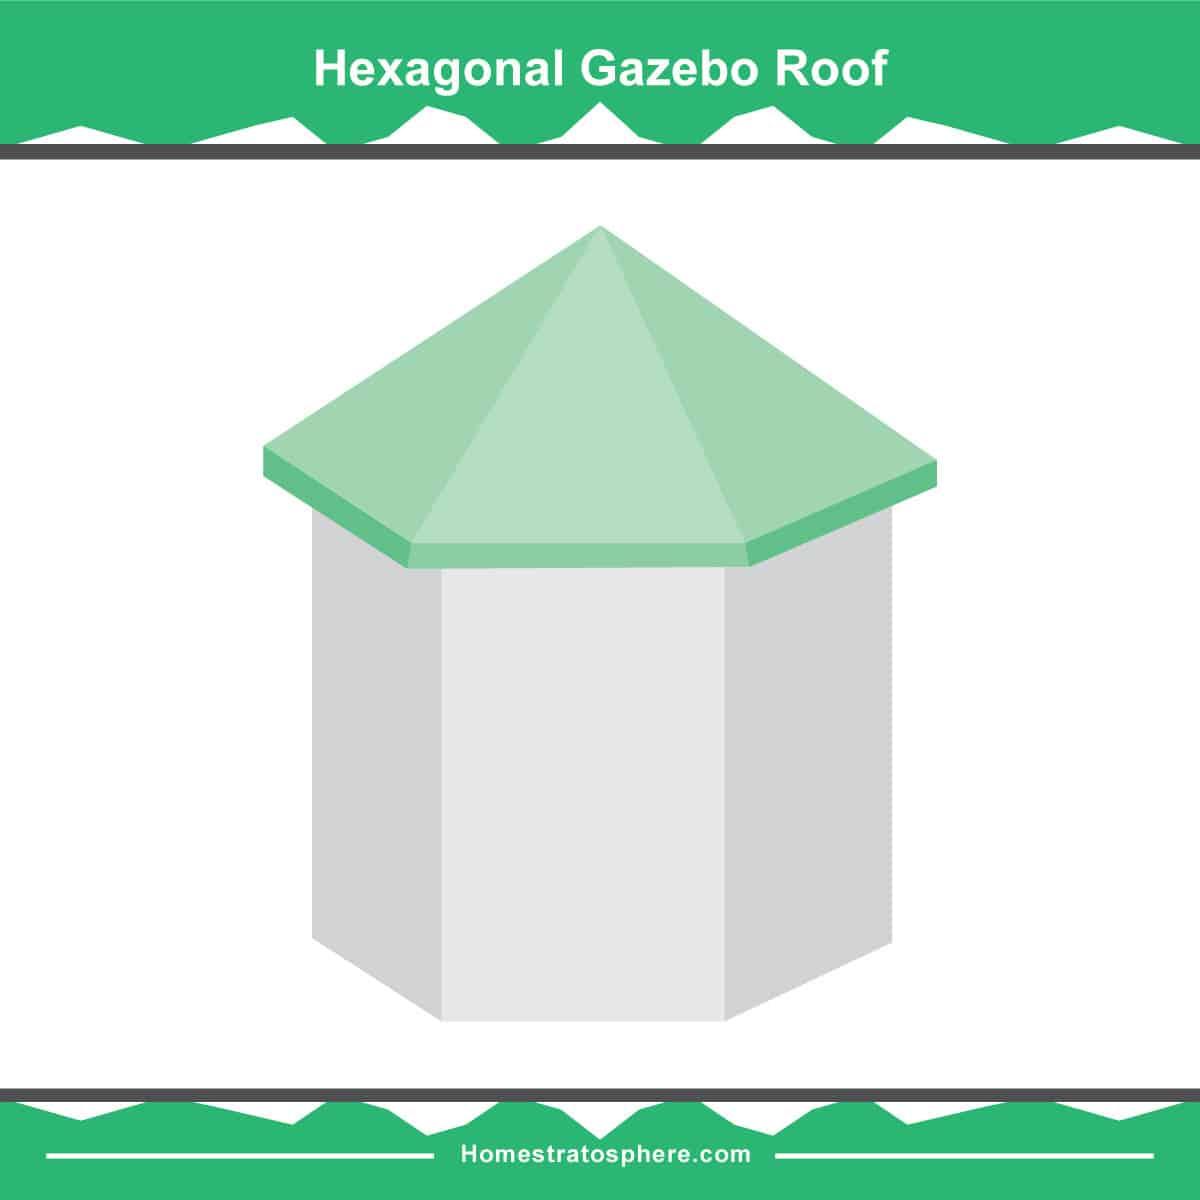 Hexagonal gazebo roof diagram